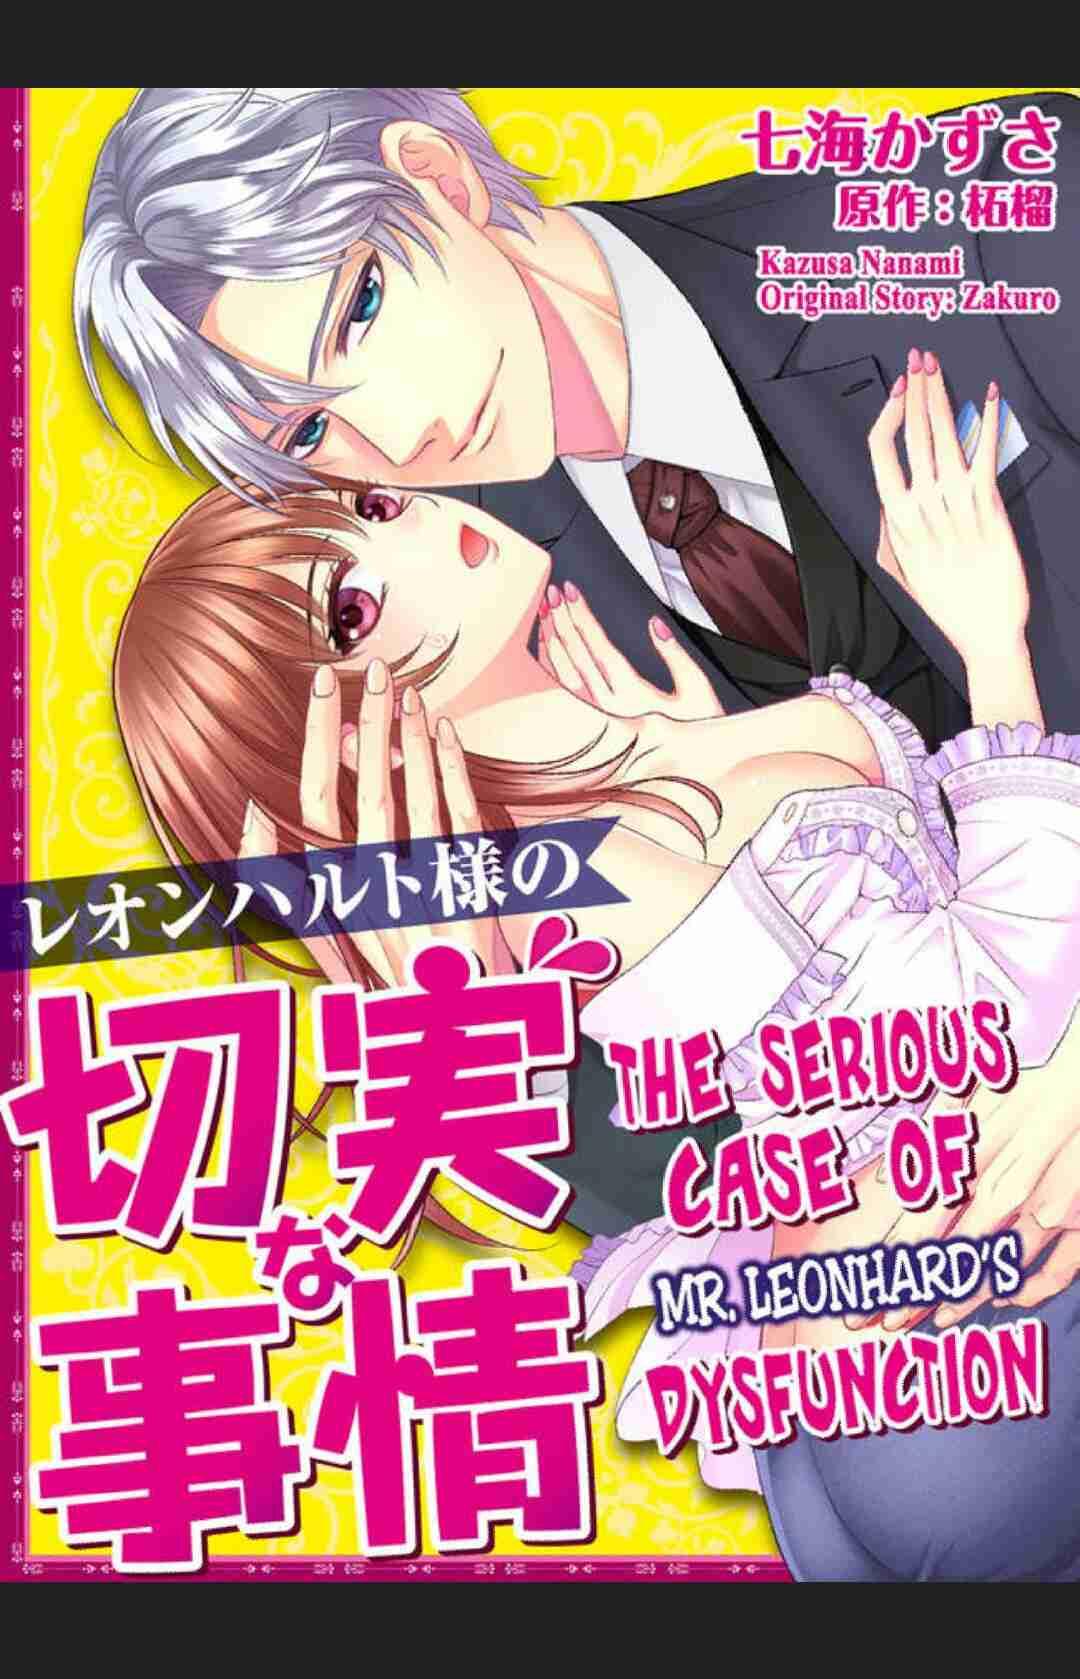 https://manga.mangadogs.com/comics/pic2/62/32574/926004/2da37507d2177cbb5af17795db30fd1e.jpg Page 1